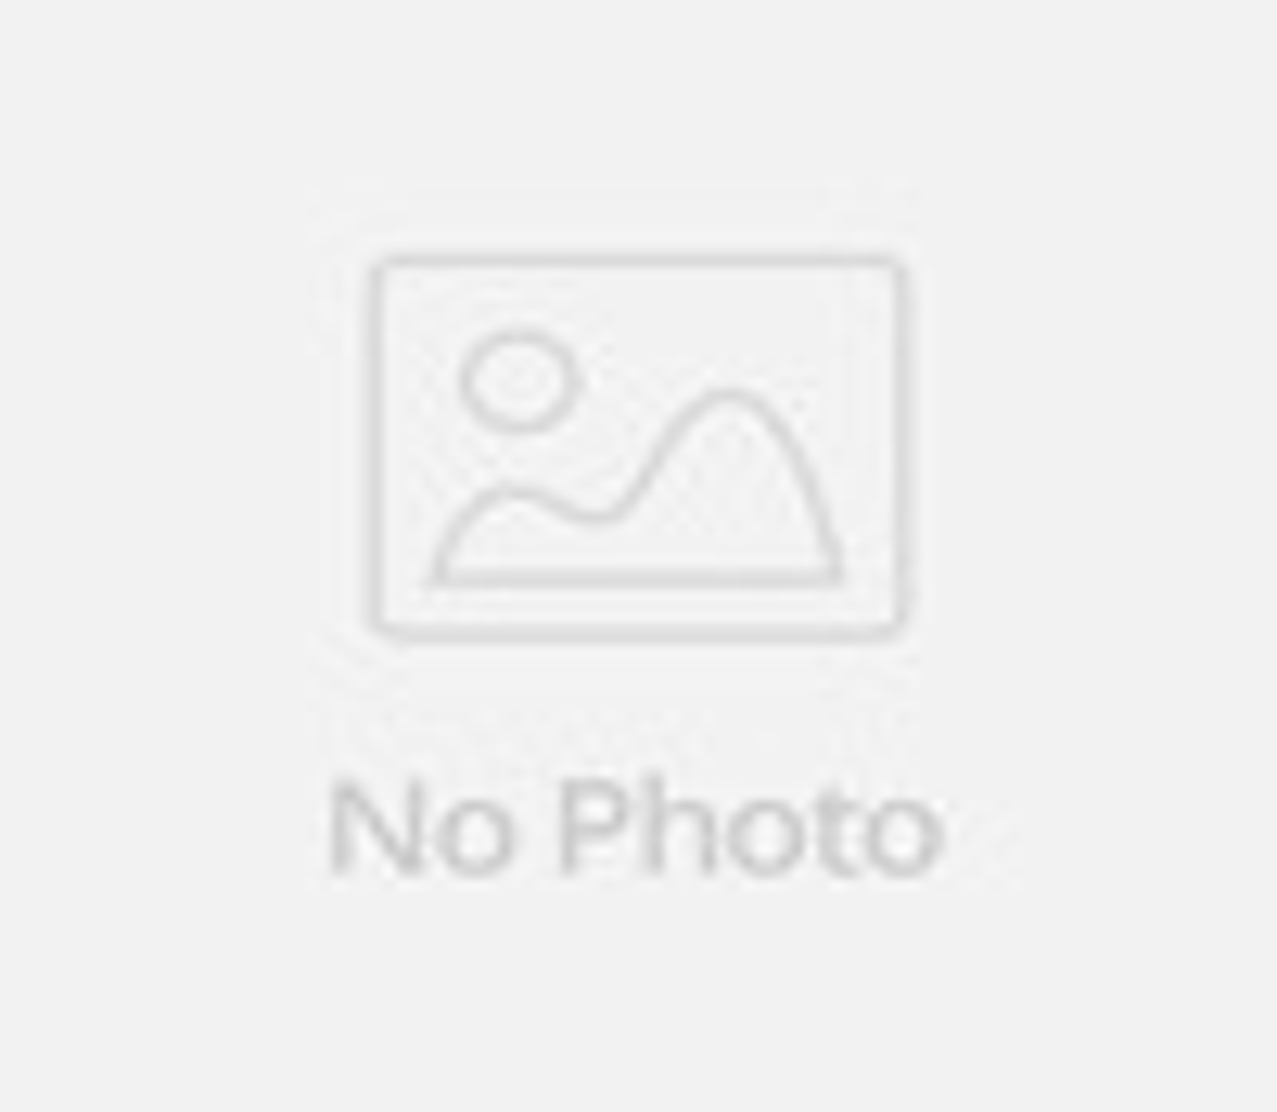 86mm 3 Phase Stepper Motor View 3 Phase Stepper Motor